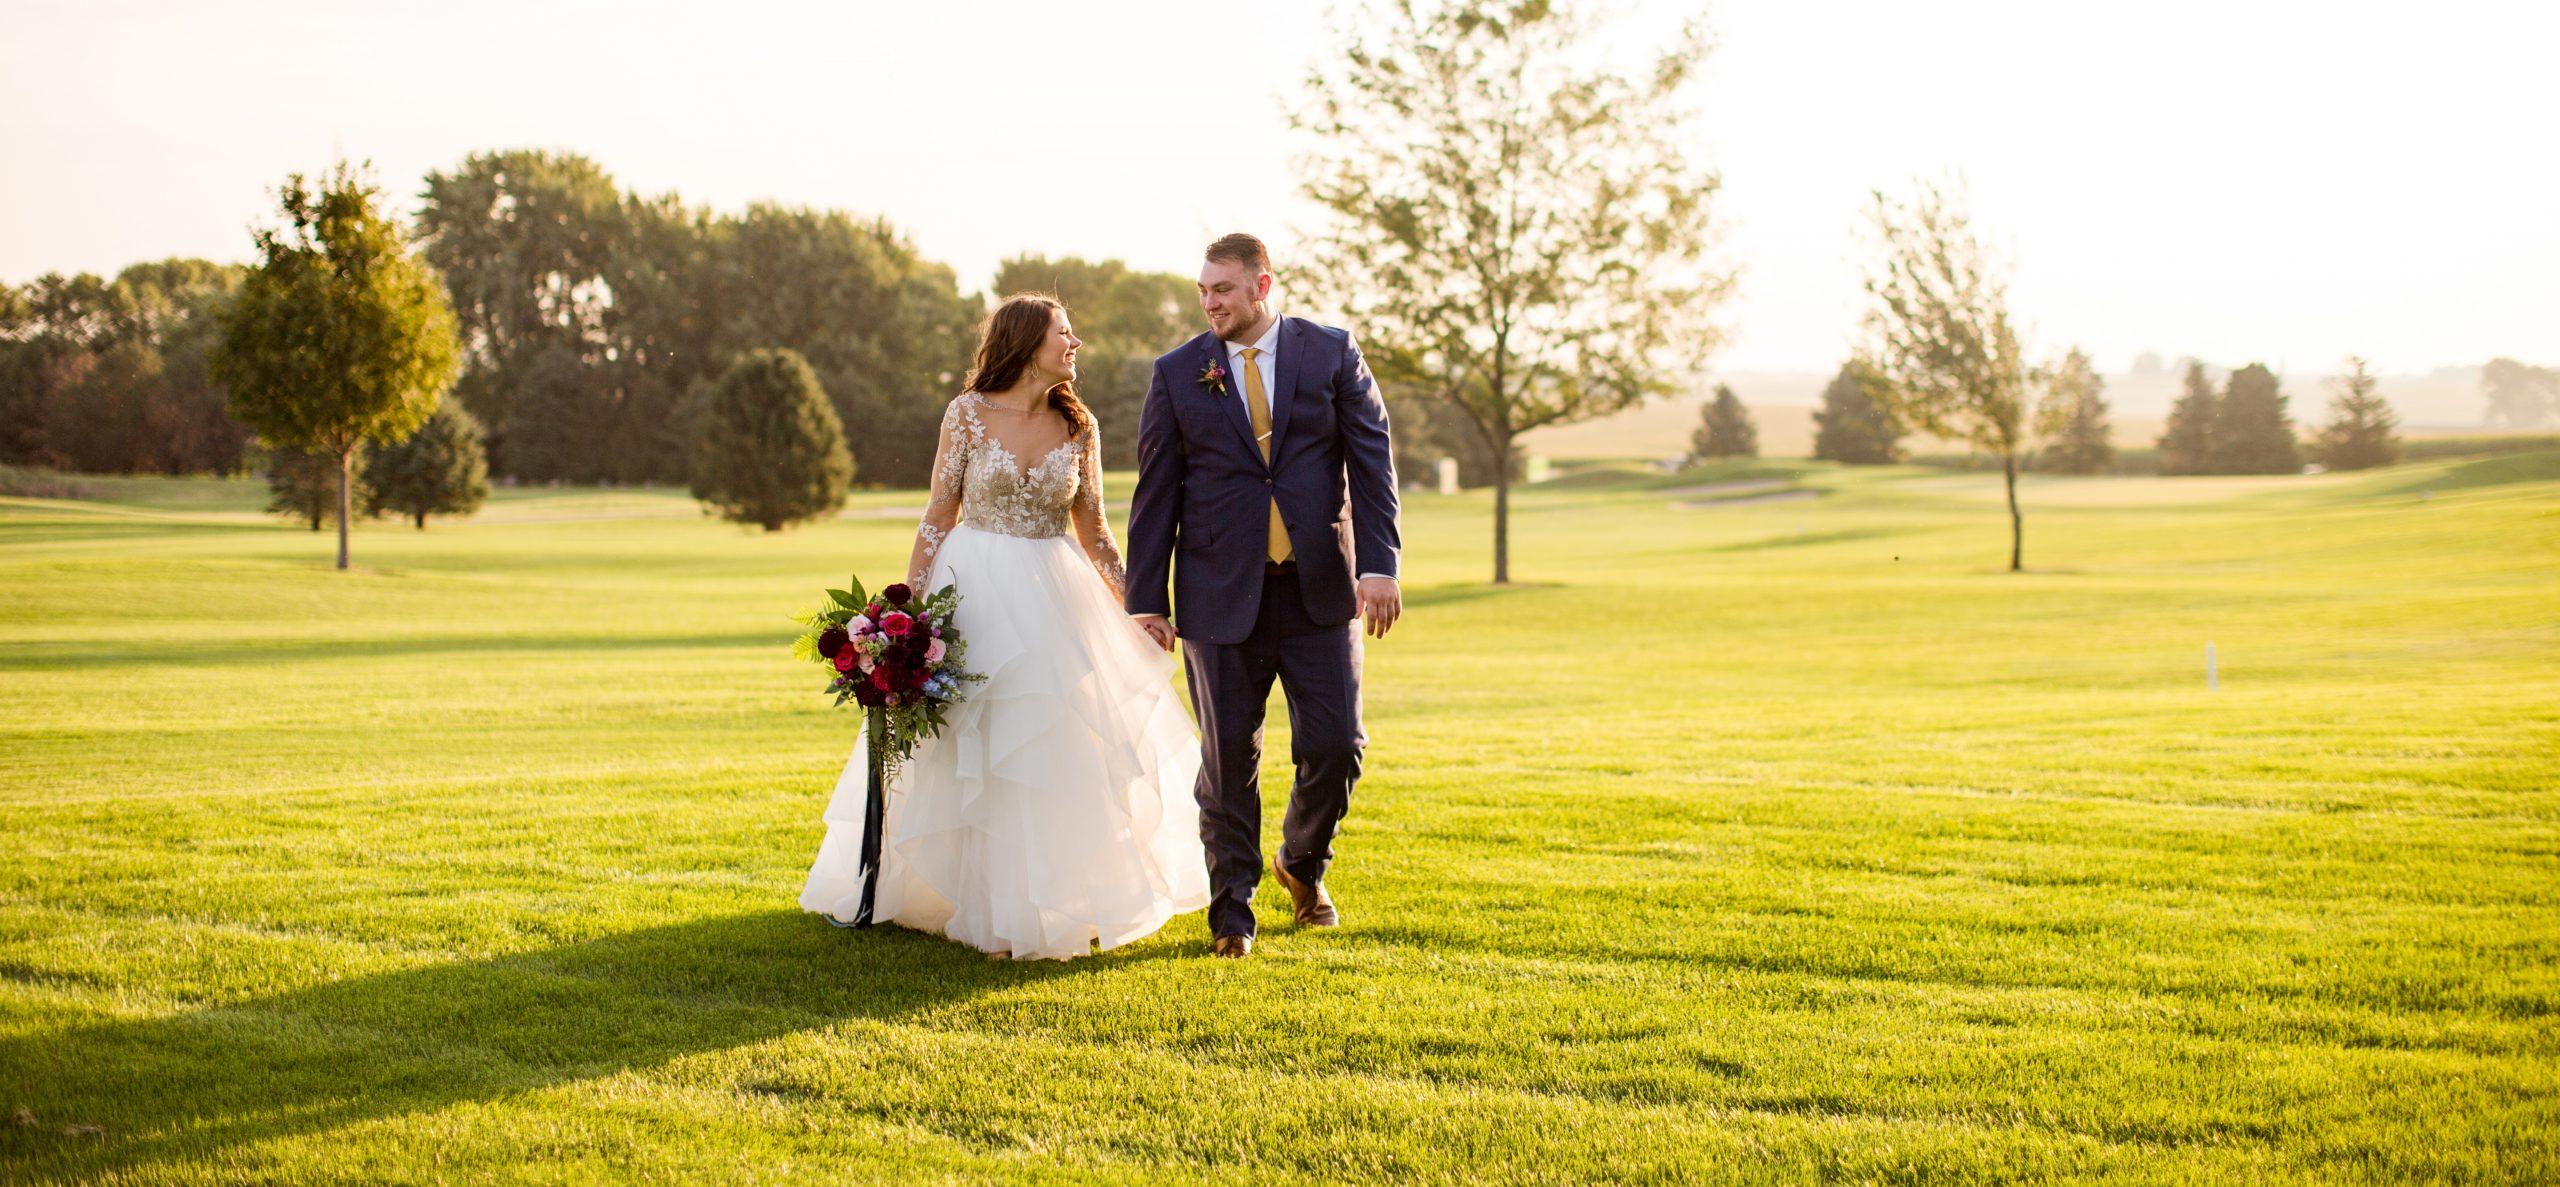 Wedding Slider | Special Event | The Terrace View | Weddings & Special Events Venue near me | Venues in Northwest Iowa | Indoor and Outdoor wedding